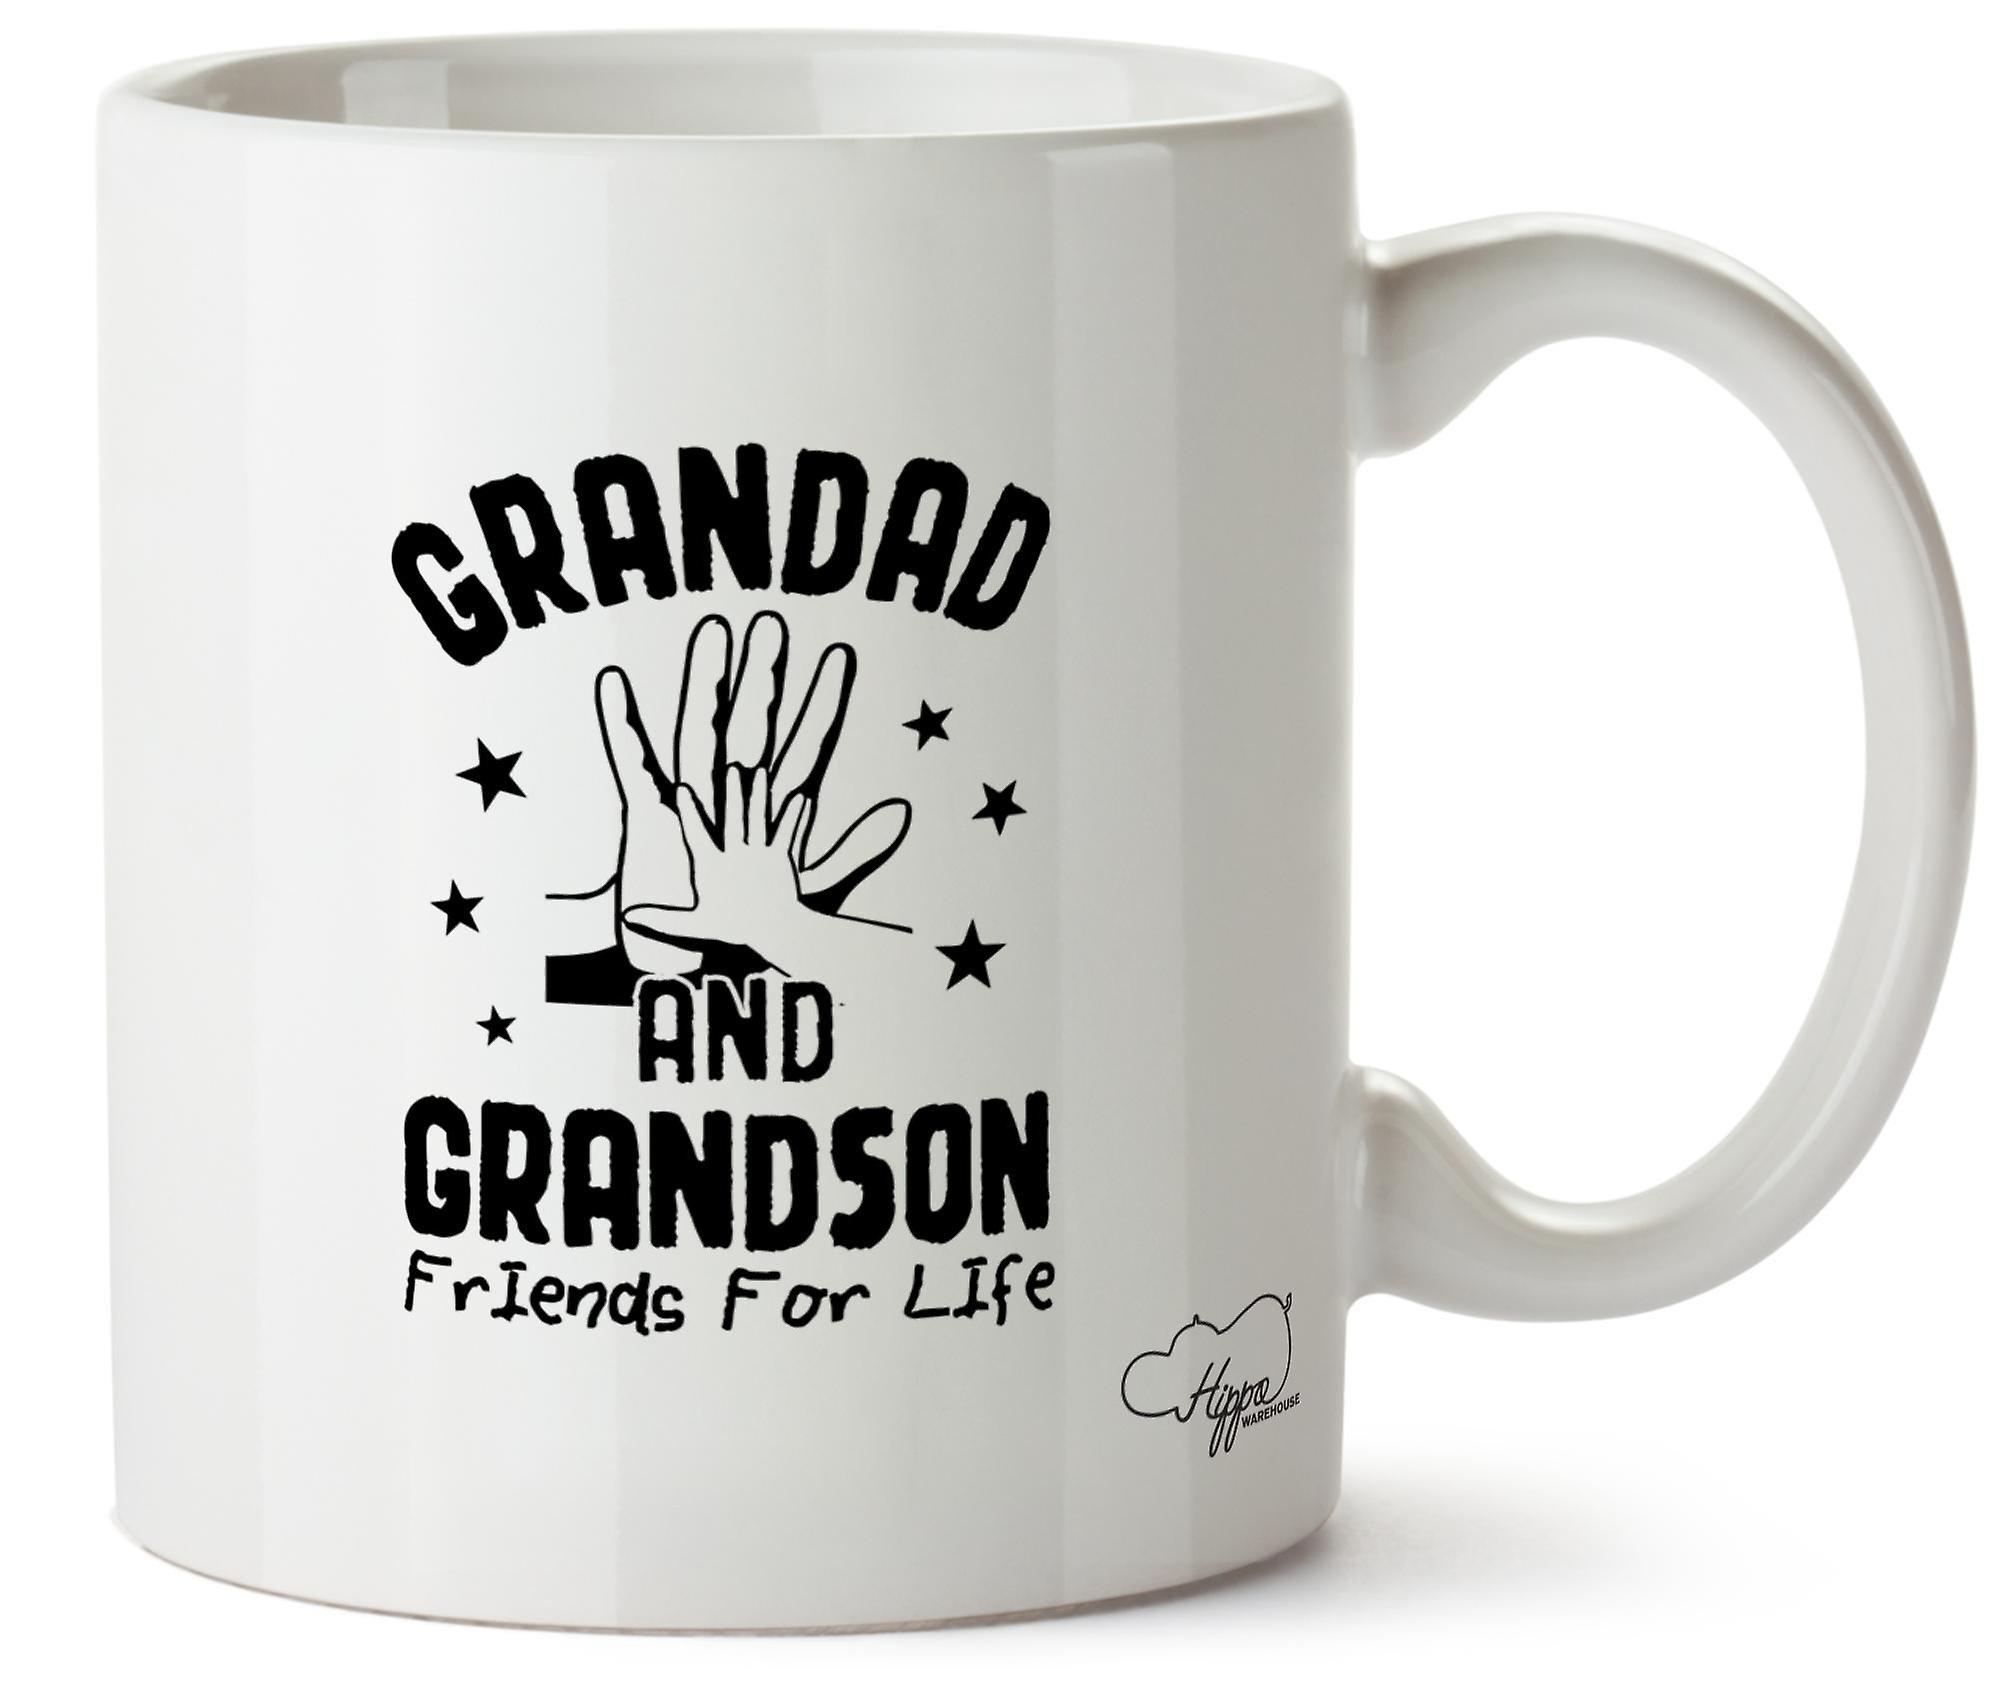 Hippowarehouse Grandad And Grandson Friends For Life 10oz Mug Cup